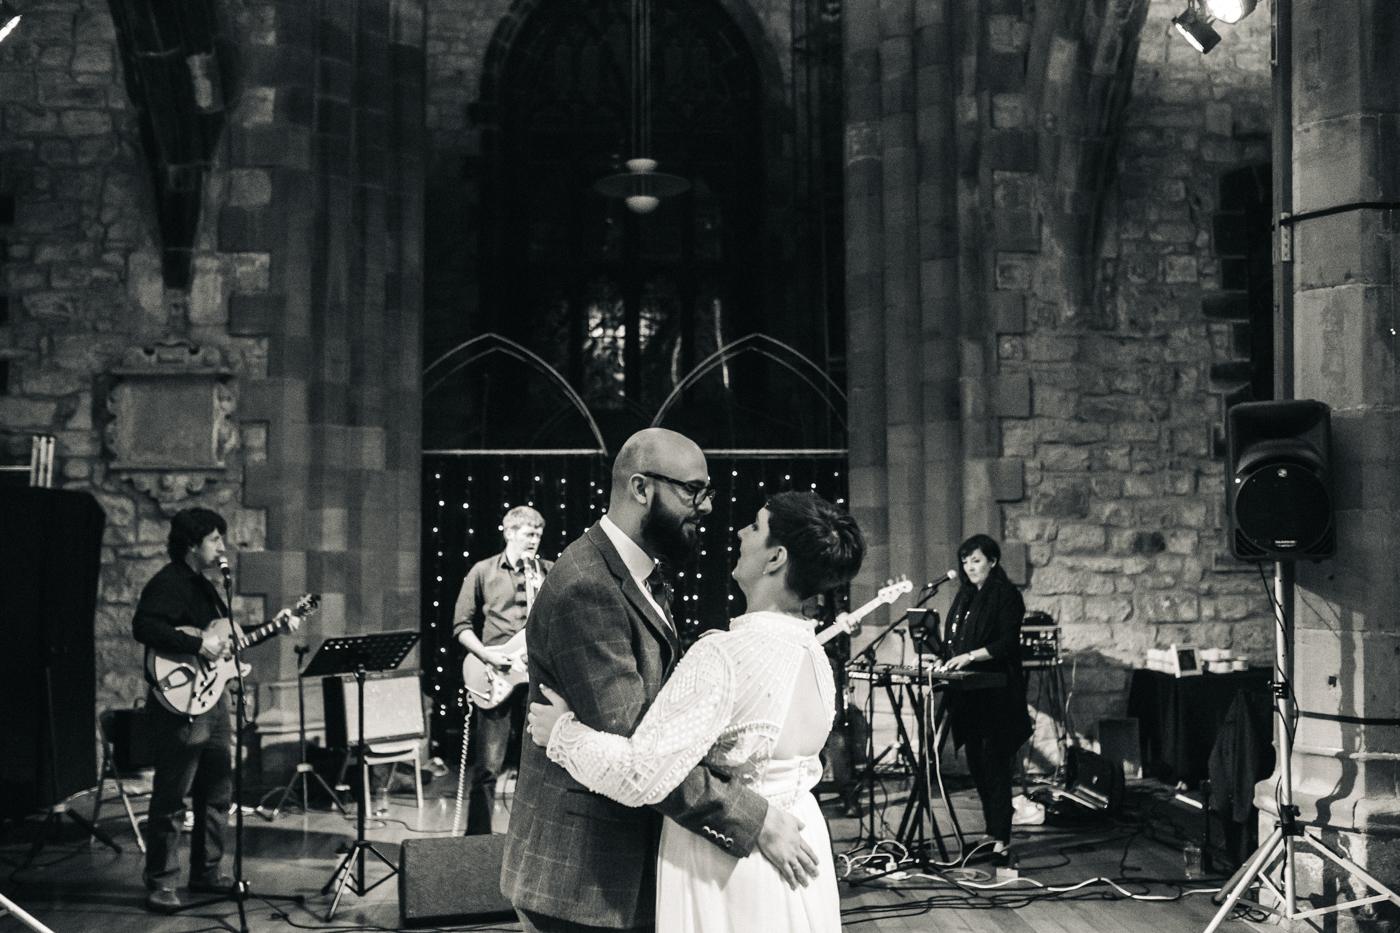 teesside-newcastle-gateshead-wedding-photography-photographer-creative-0076.jpg